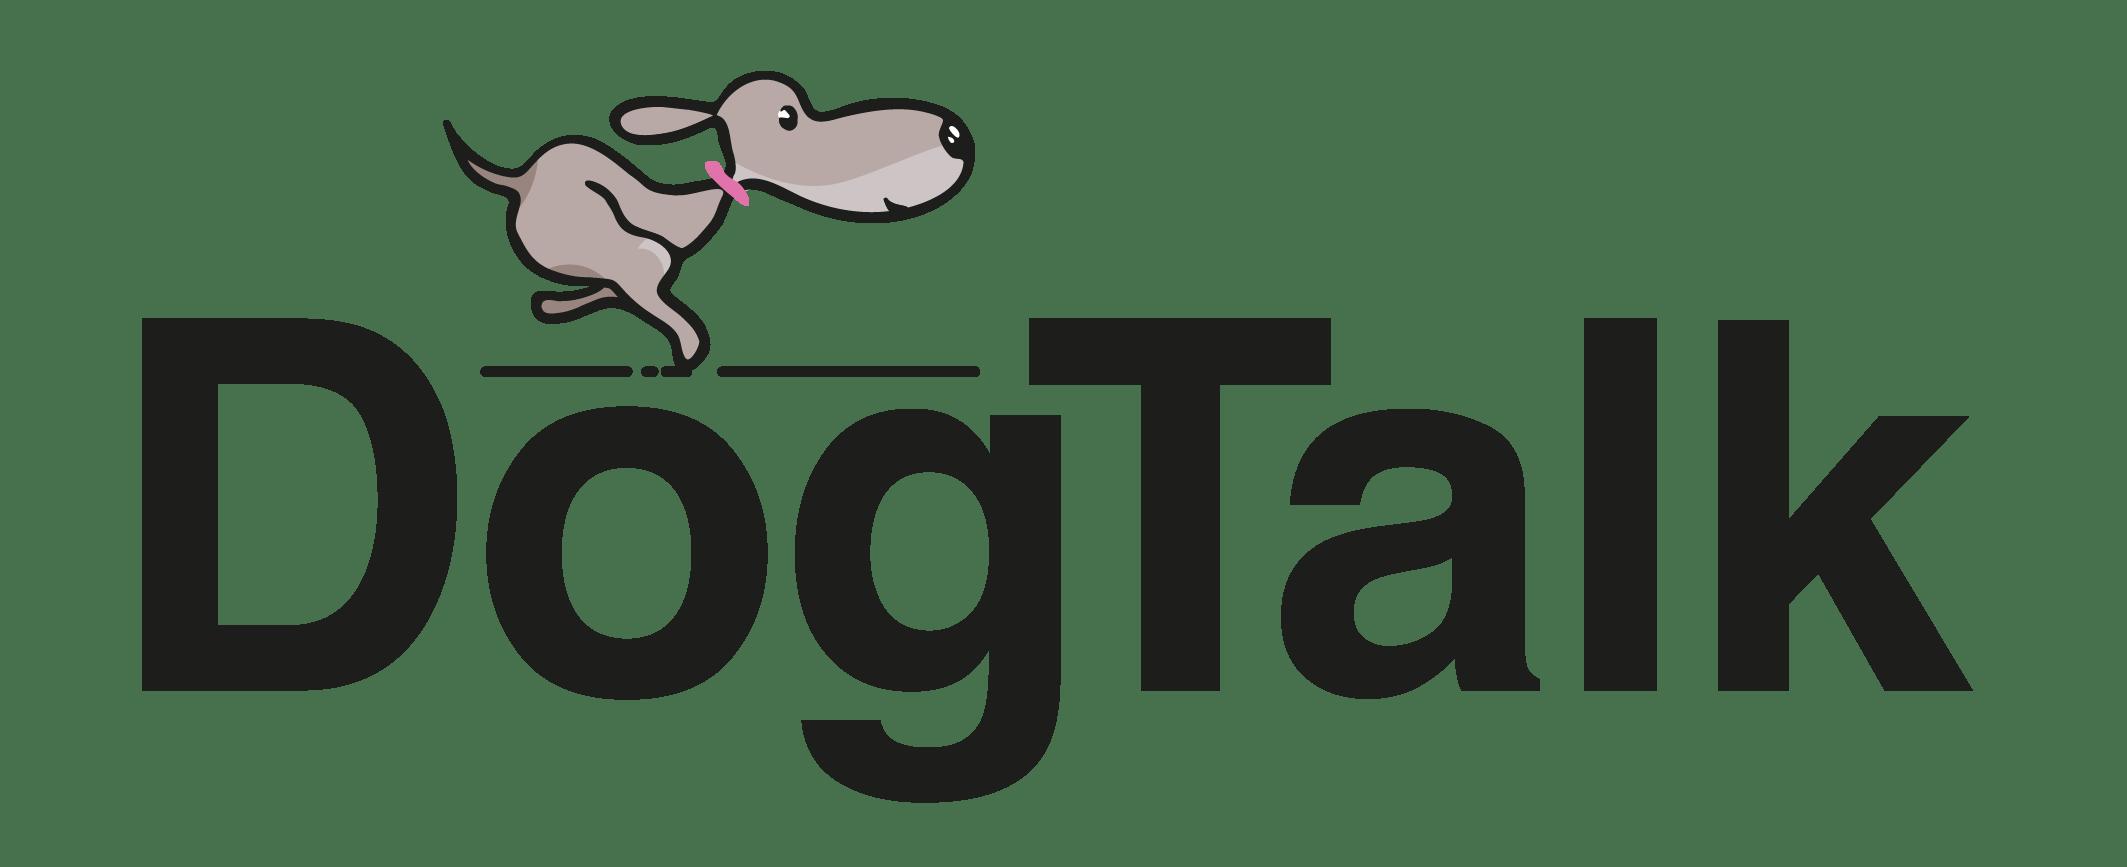 DogTalk Beagle Kennel